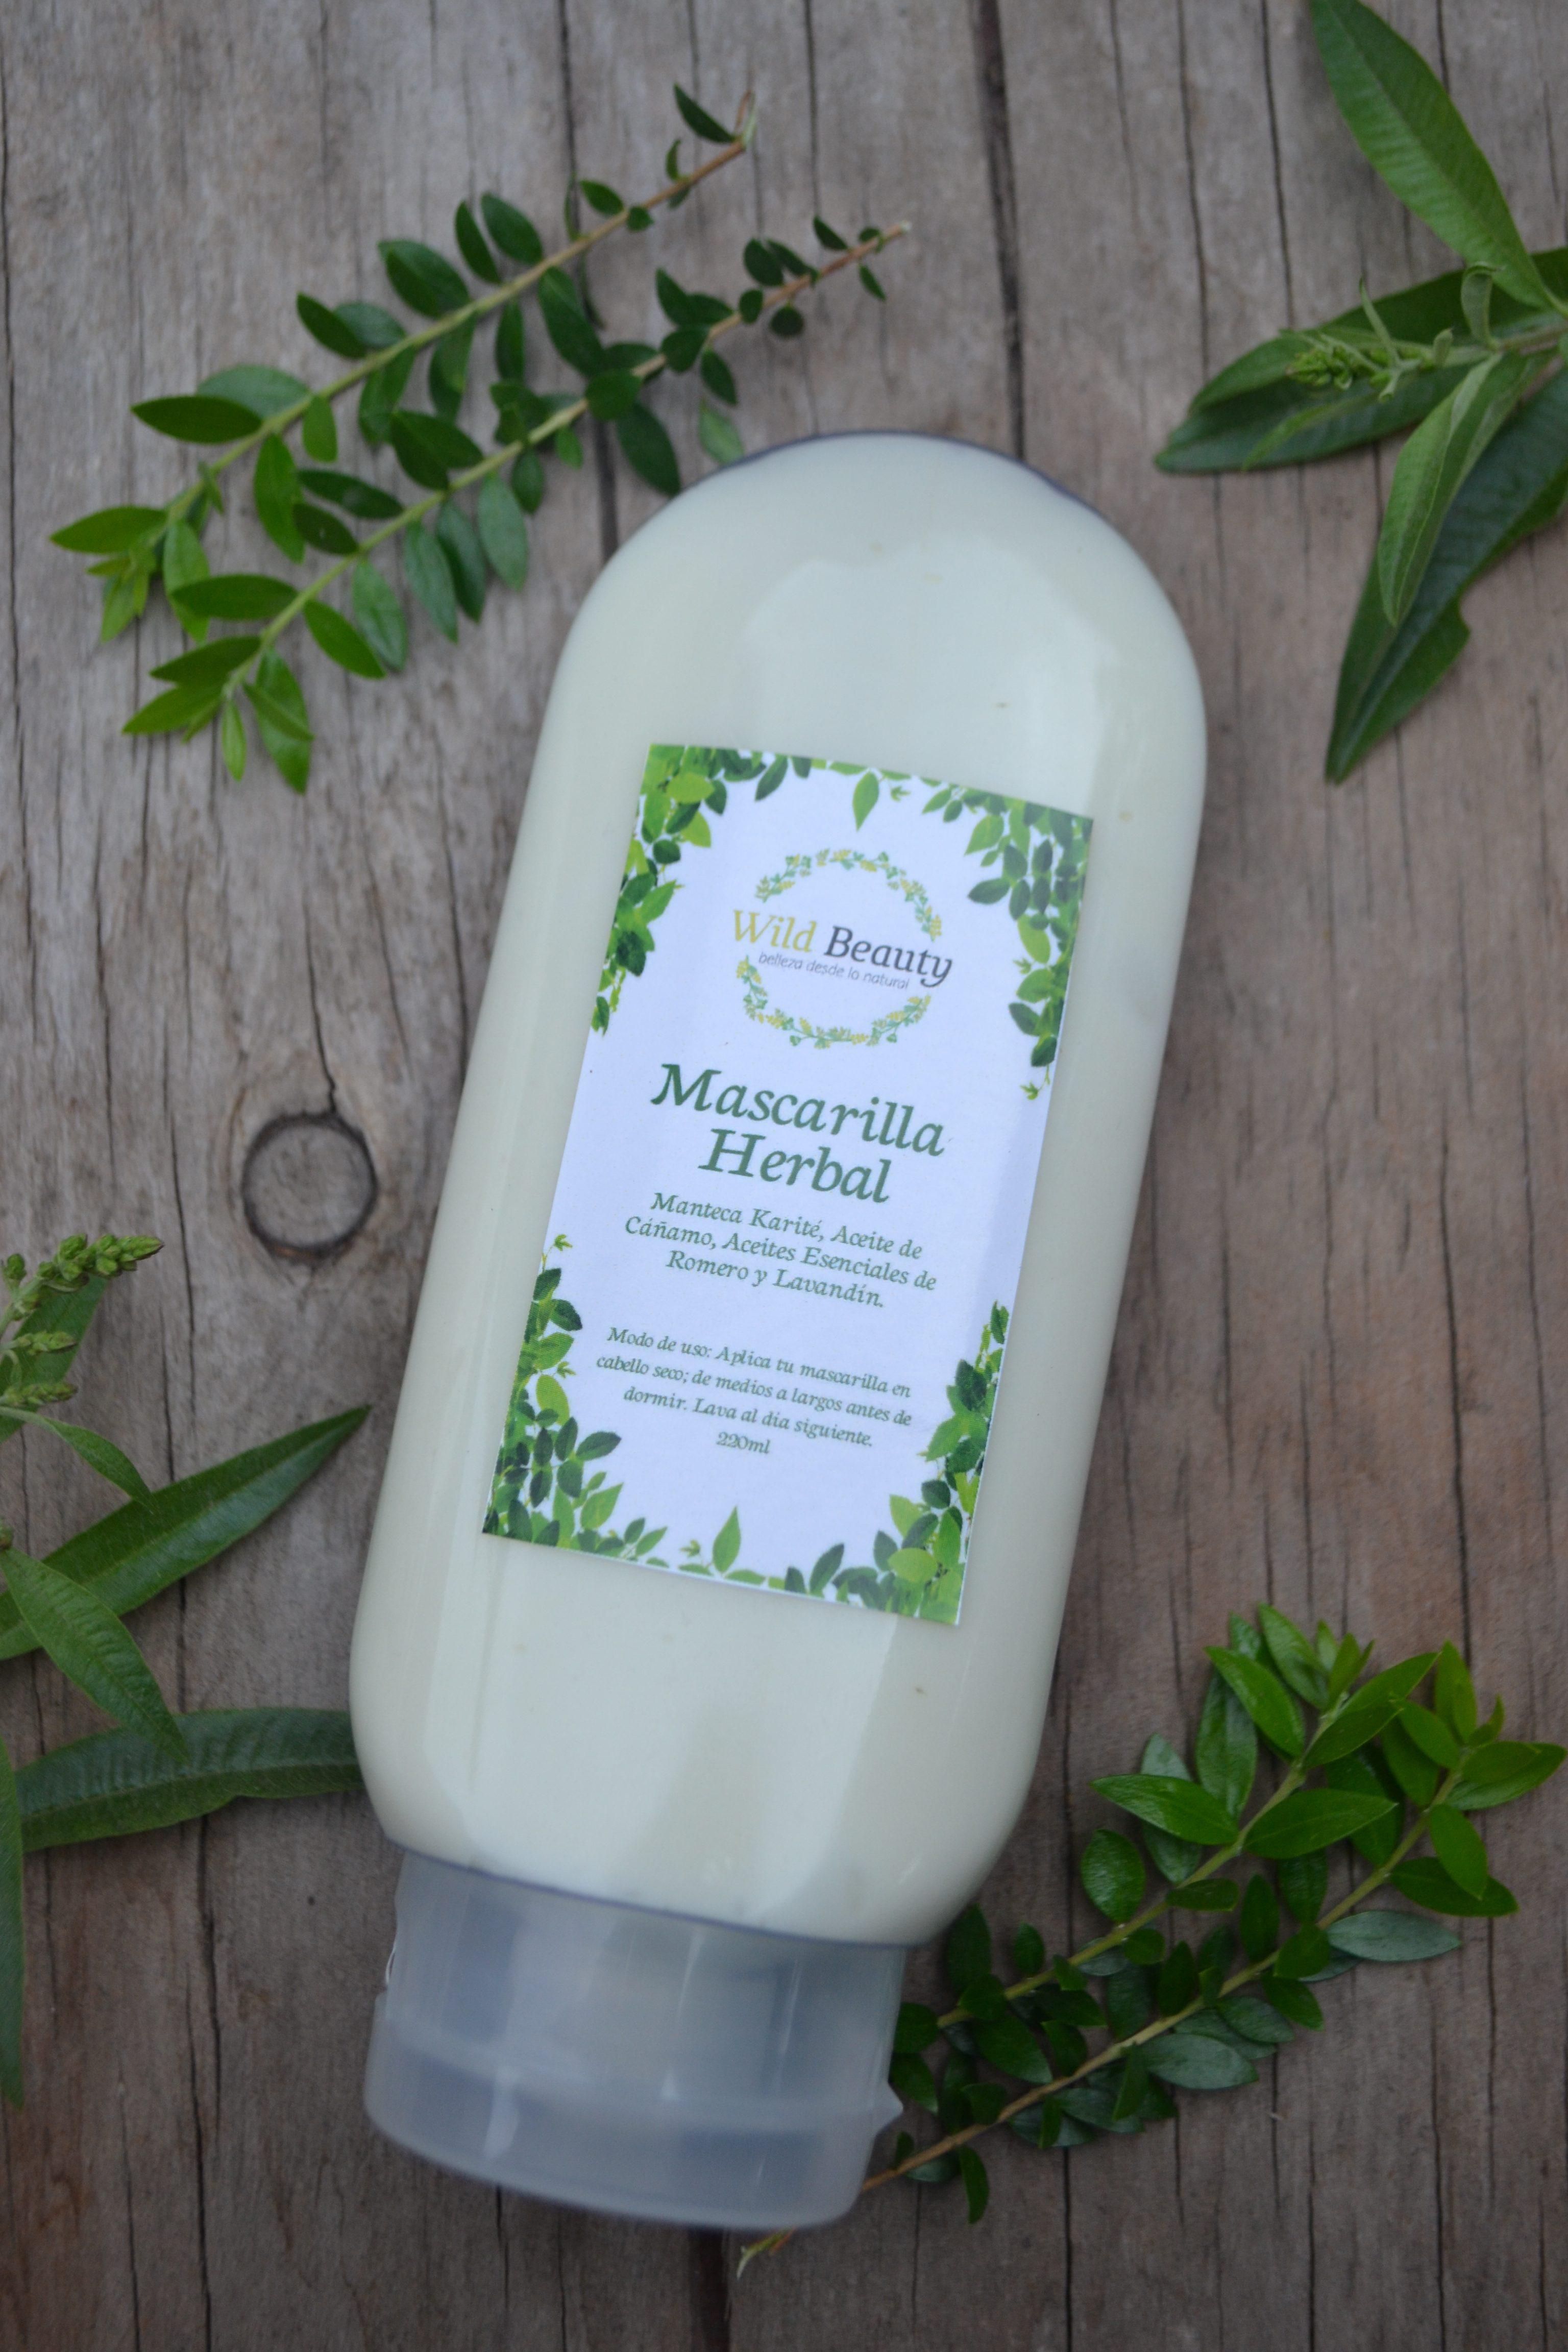 Mascarilla Herbal